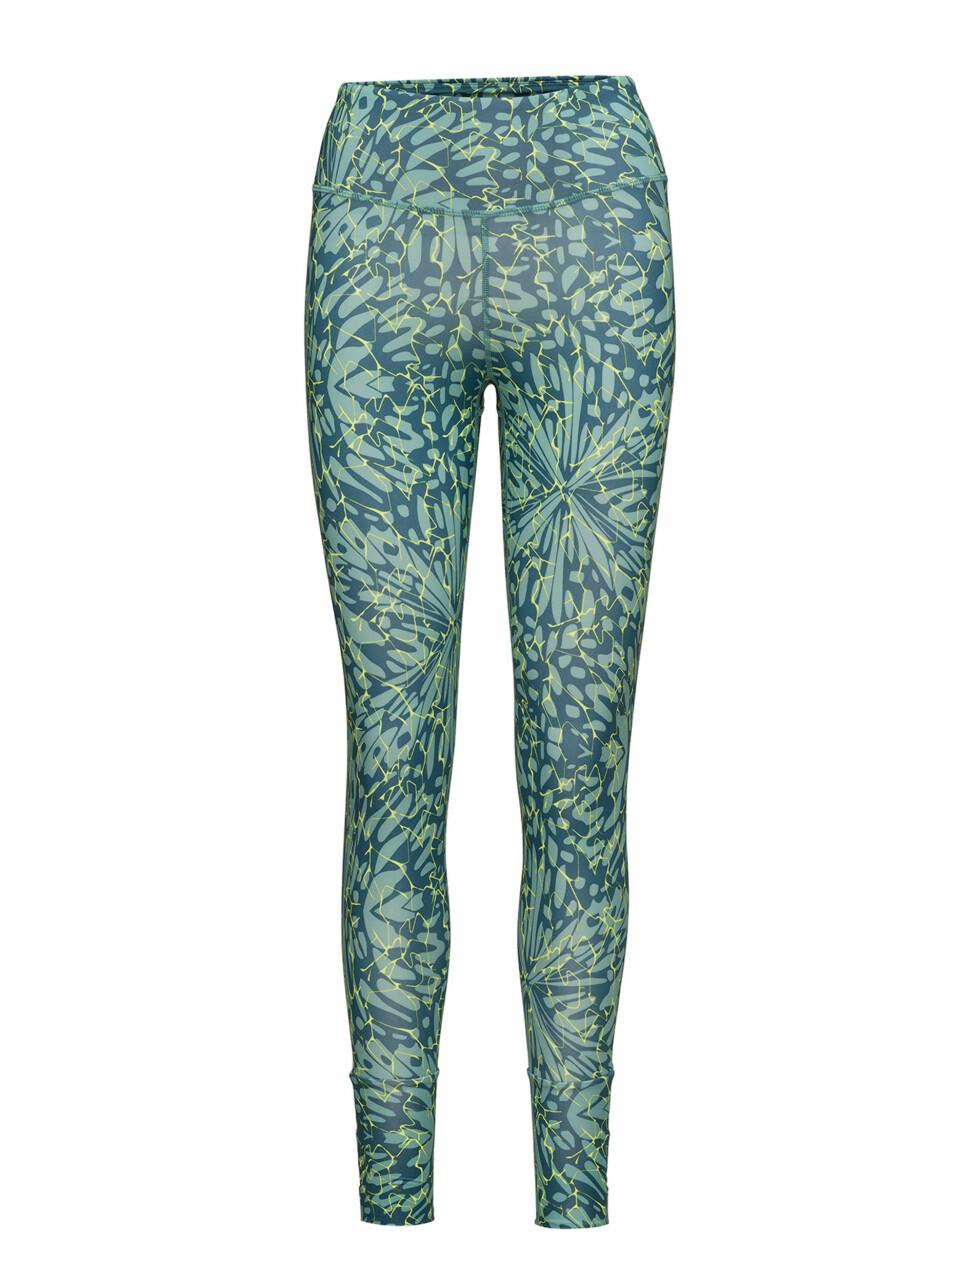 Tights fra Craft via Boozt.com |549,-| https://www.boozt.com/no/no/craft/vibe-tights-w-p-nature-gal_15906037/15906041?navId=67750&group=listing&position=1000000